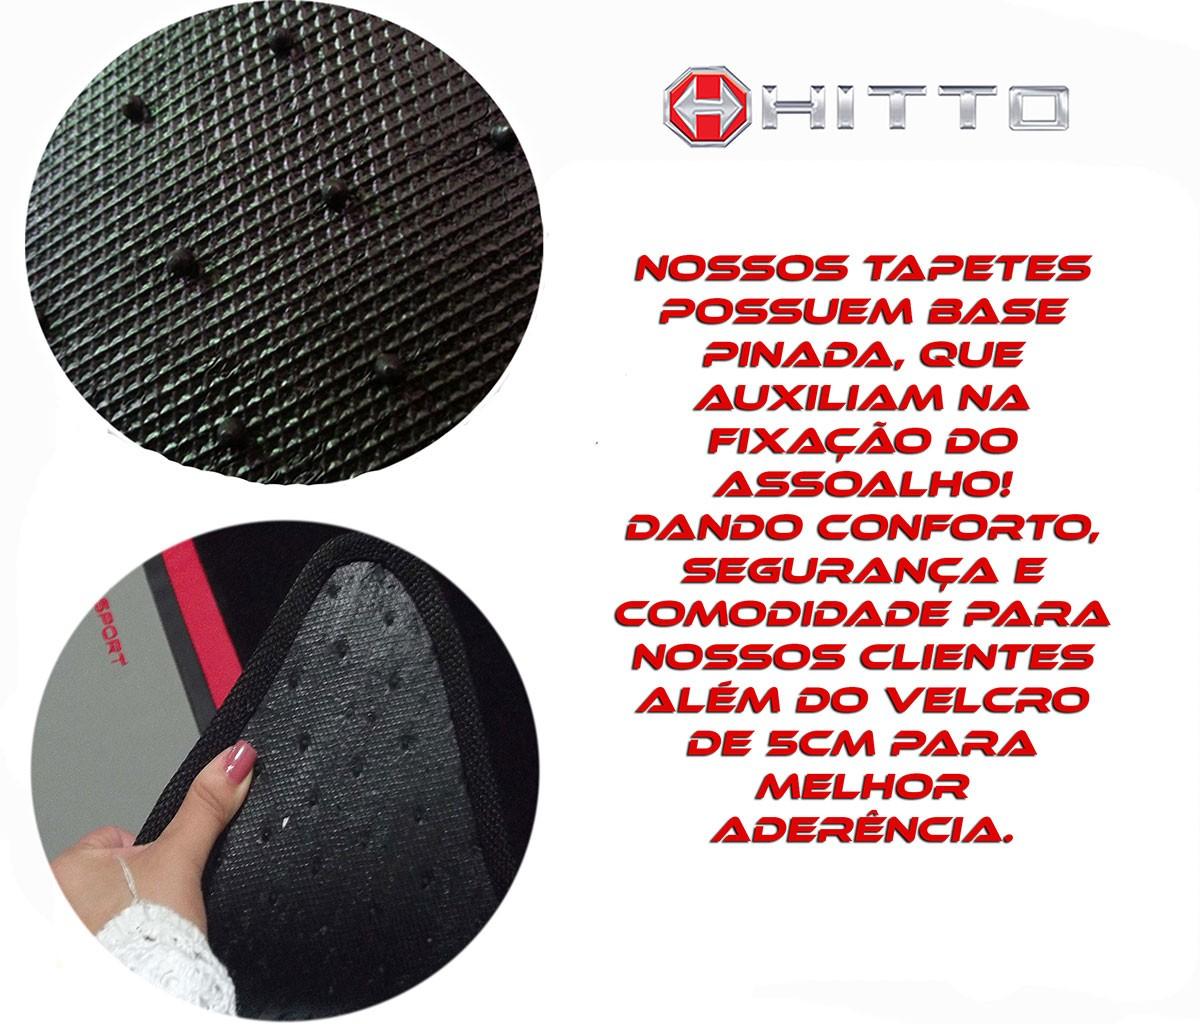 Tapete Vw Spacefox Novo C/ Ilhós Carpete Premium Base Pinada